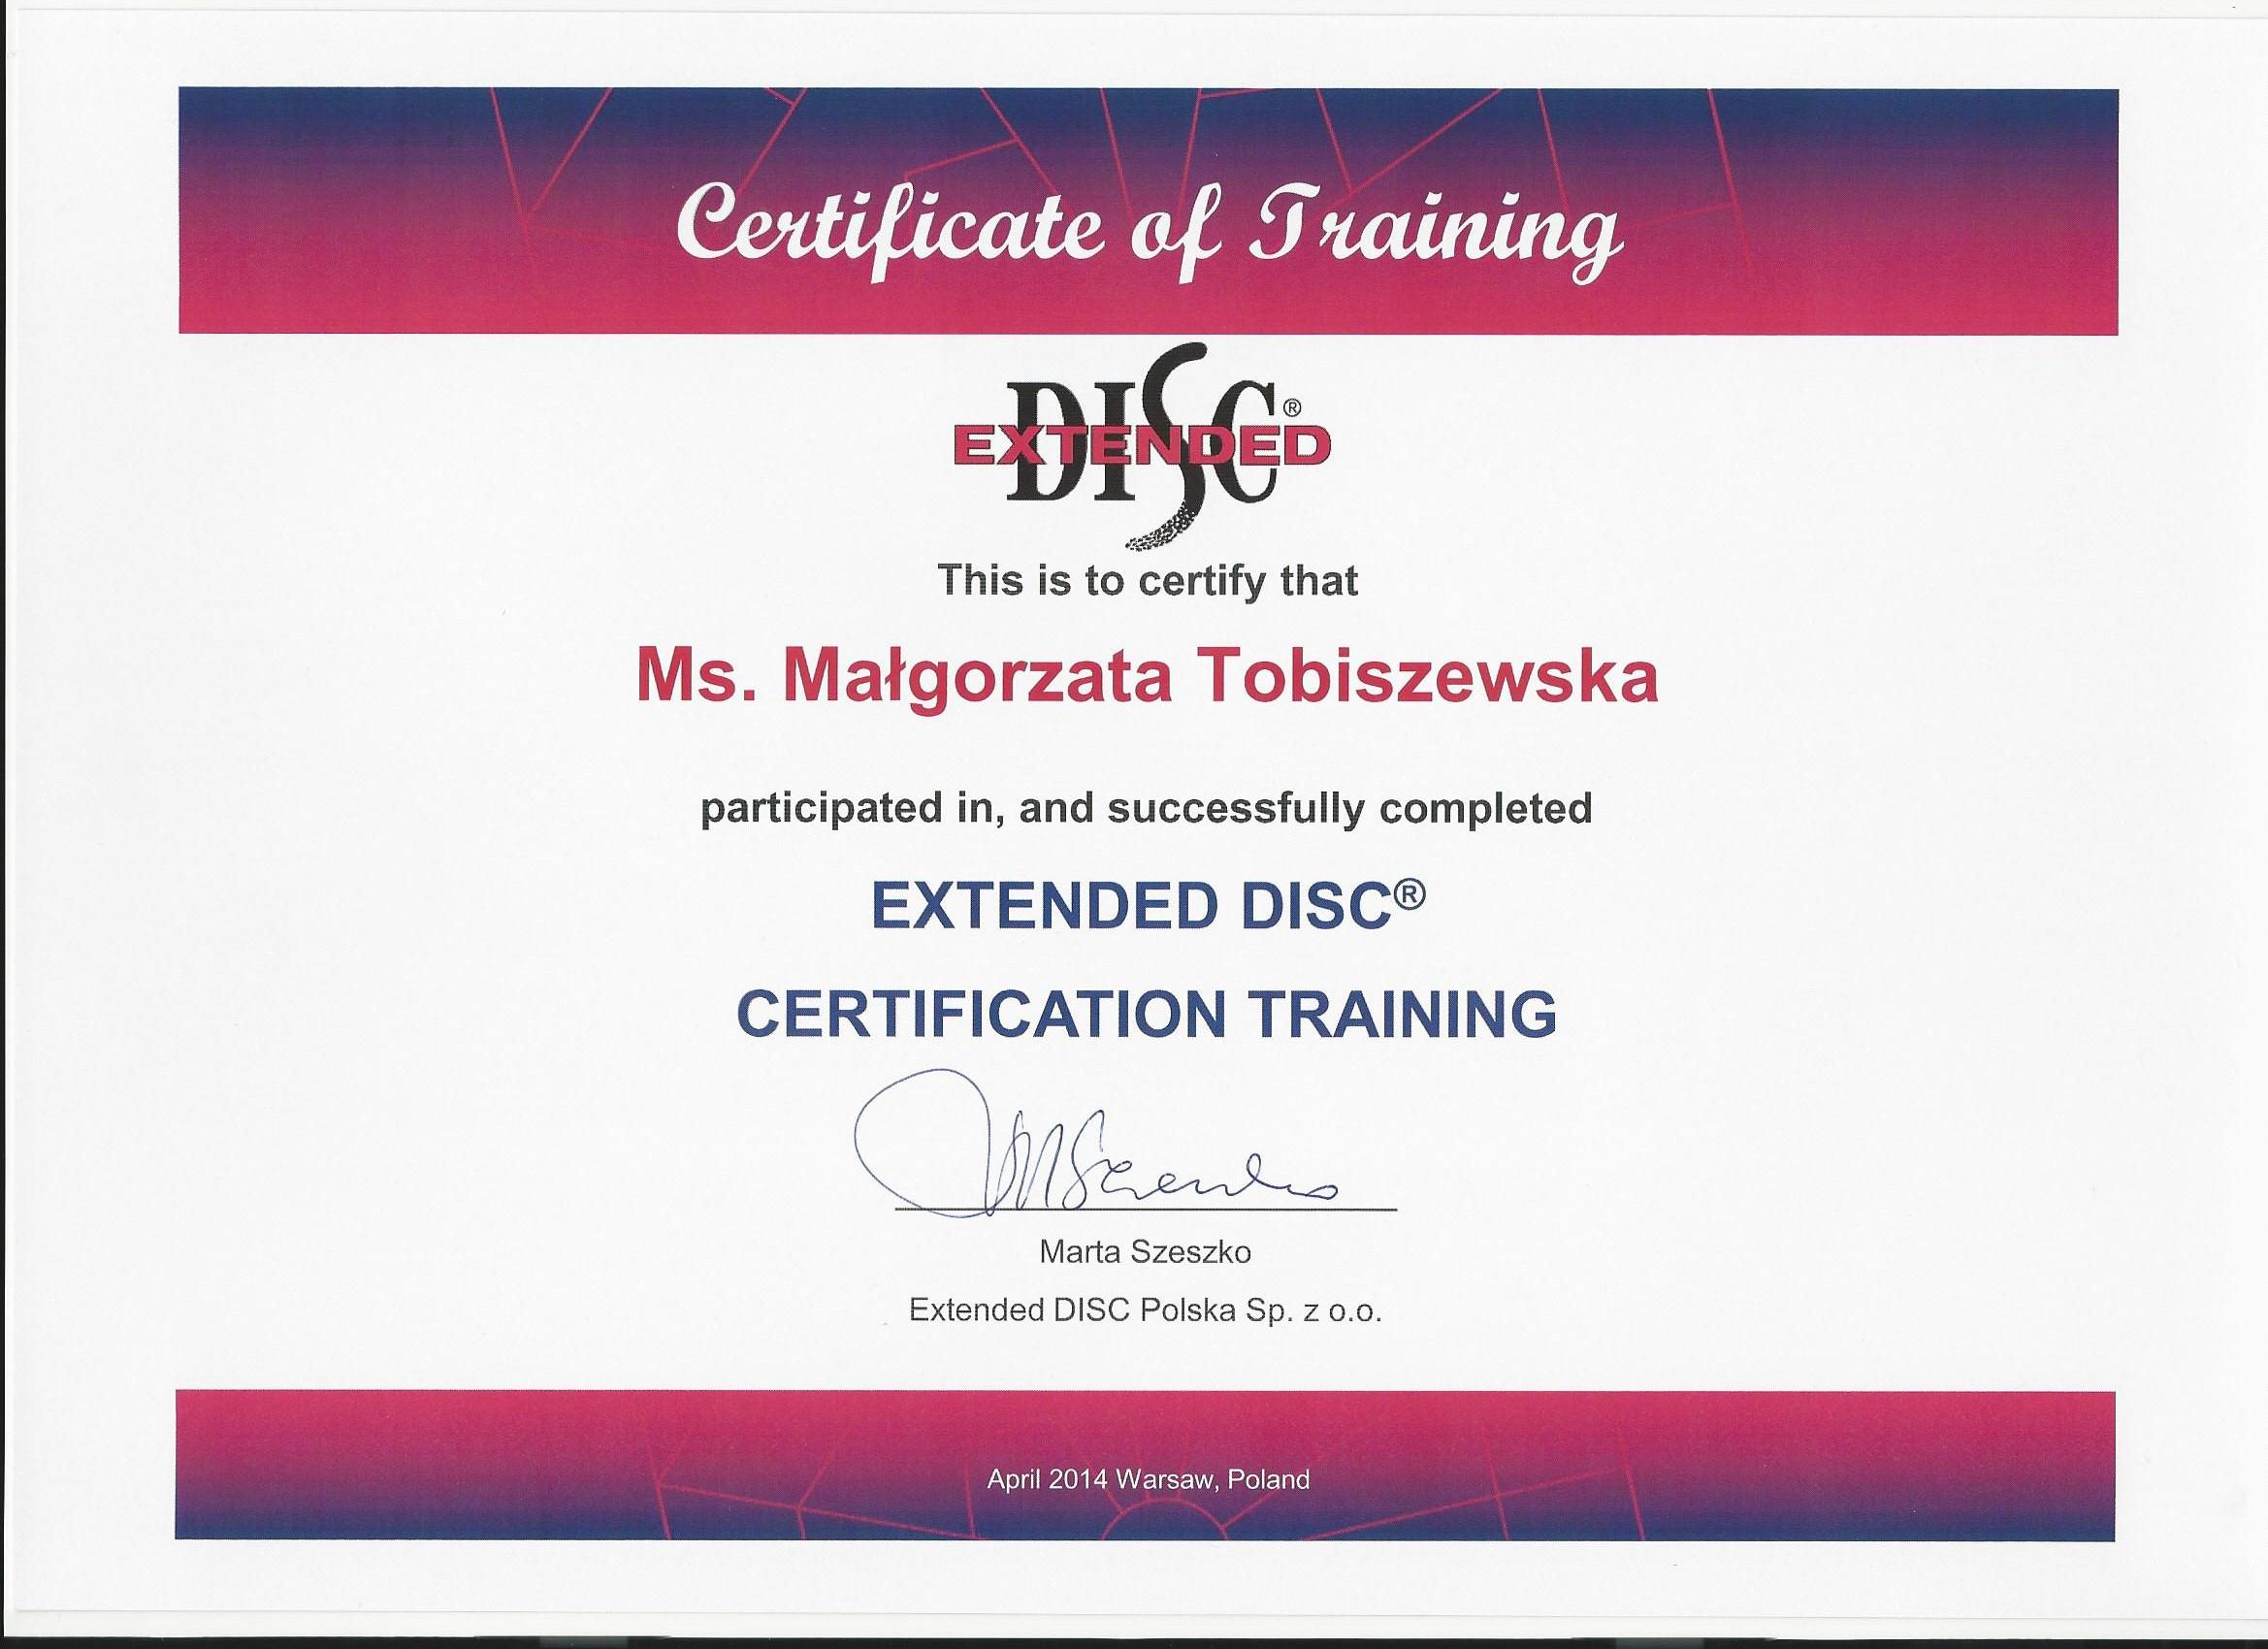 Extended DISC Małgorzata Tobiszewska